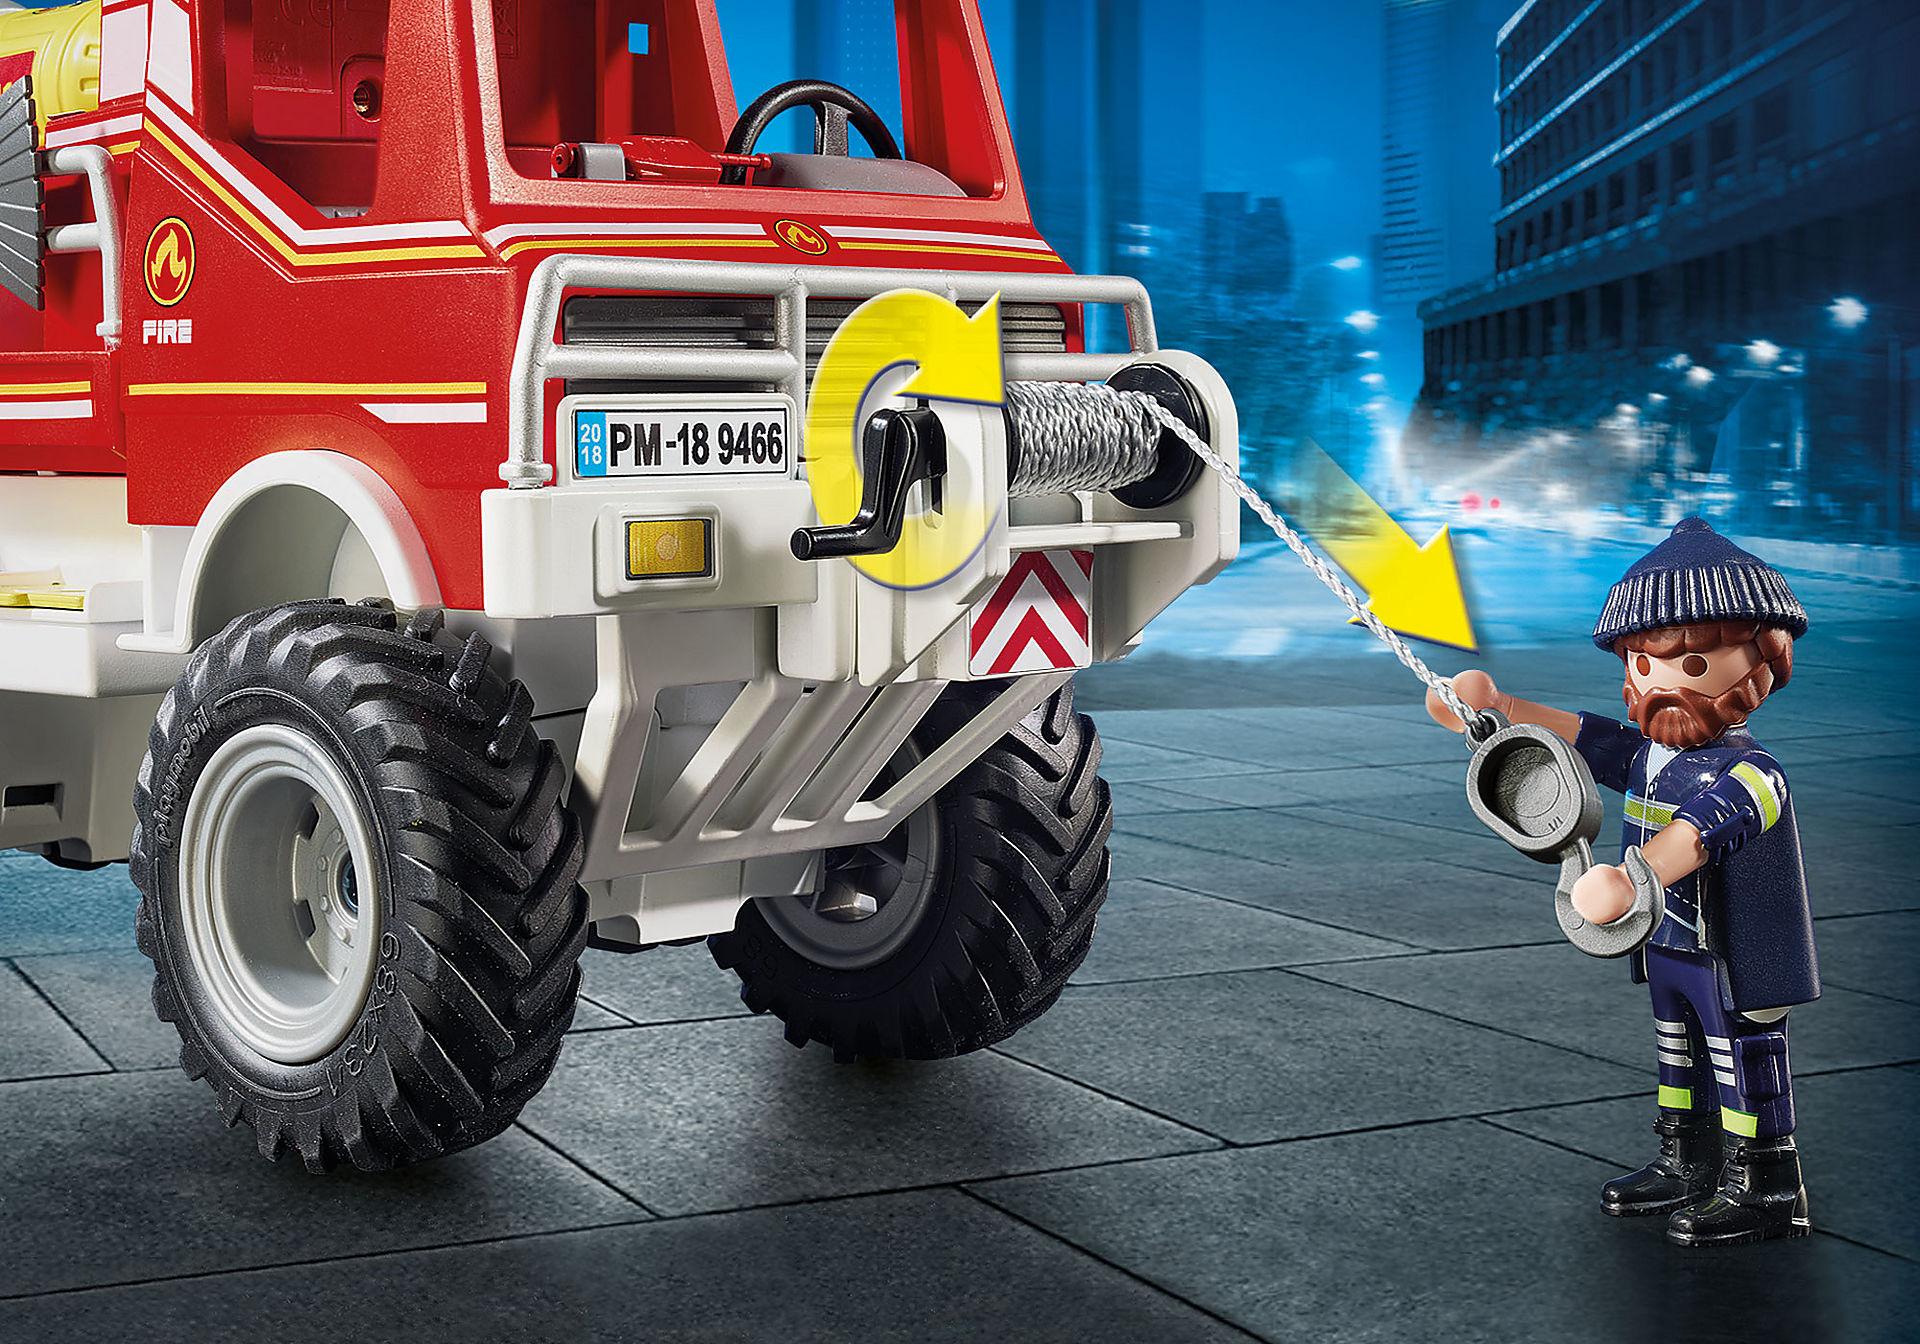 9466 Feuerwehr-Truck zoom image5